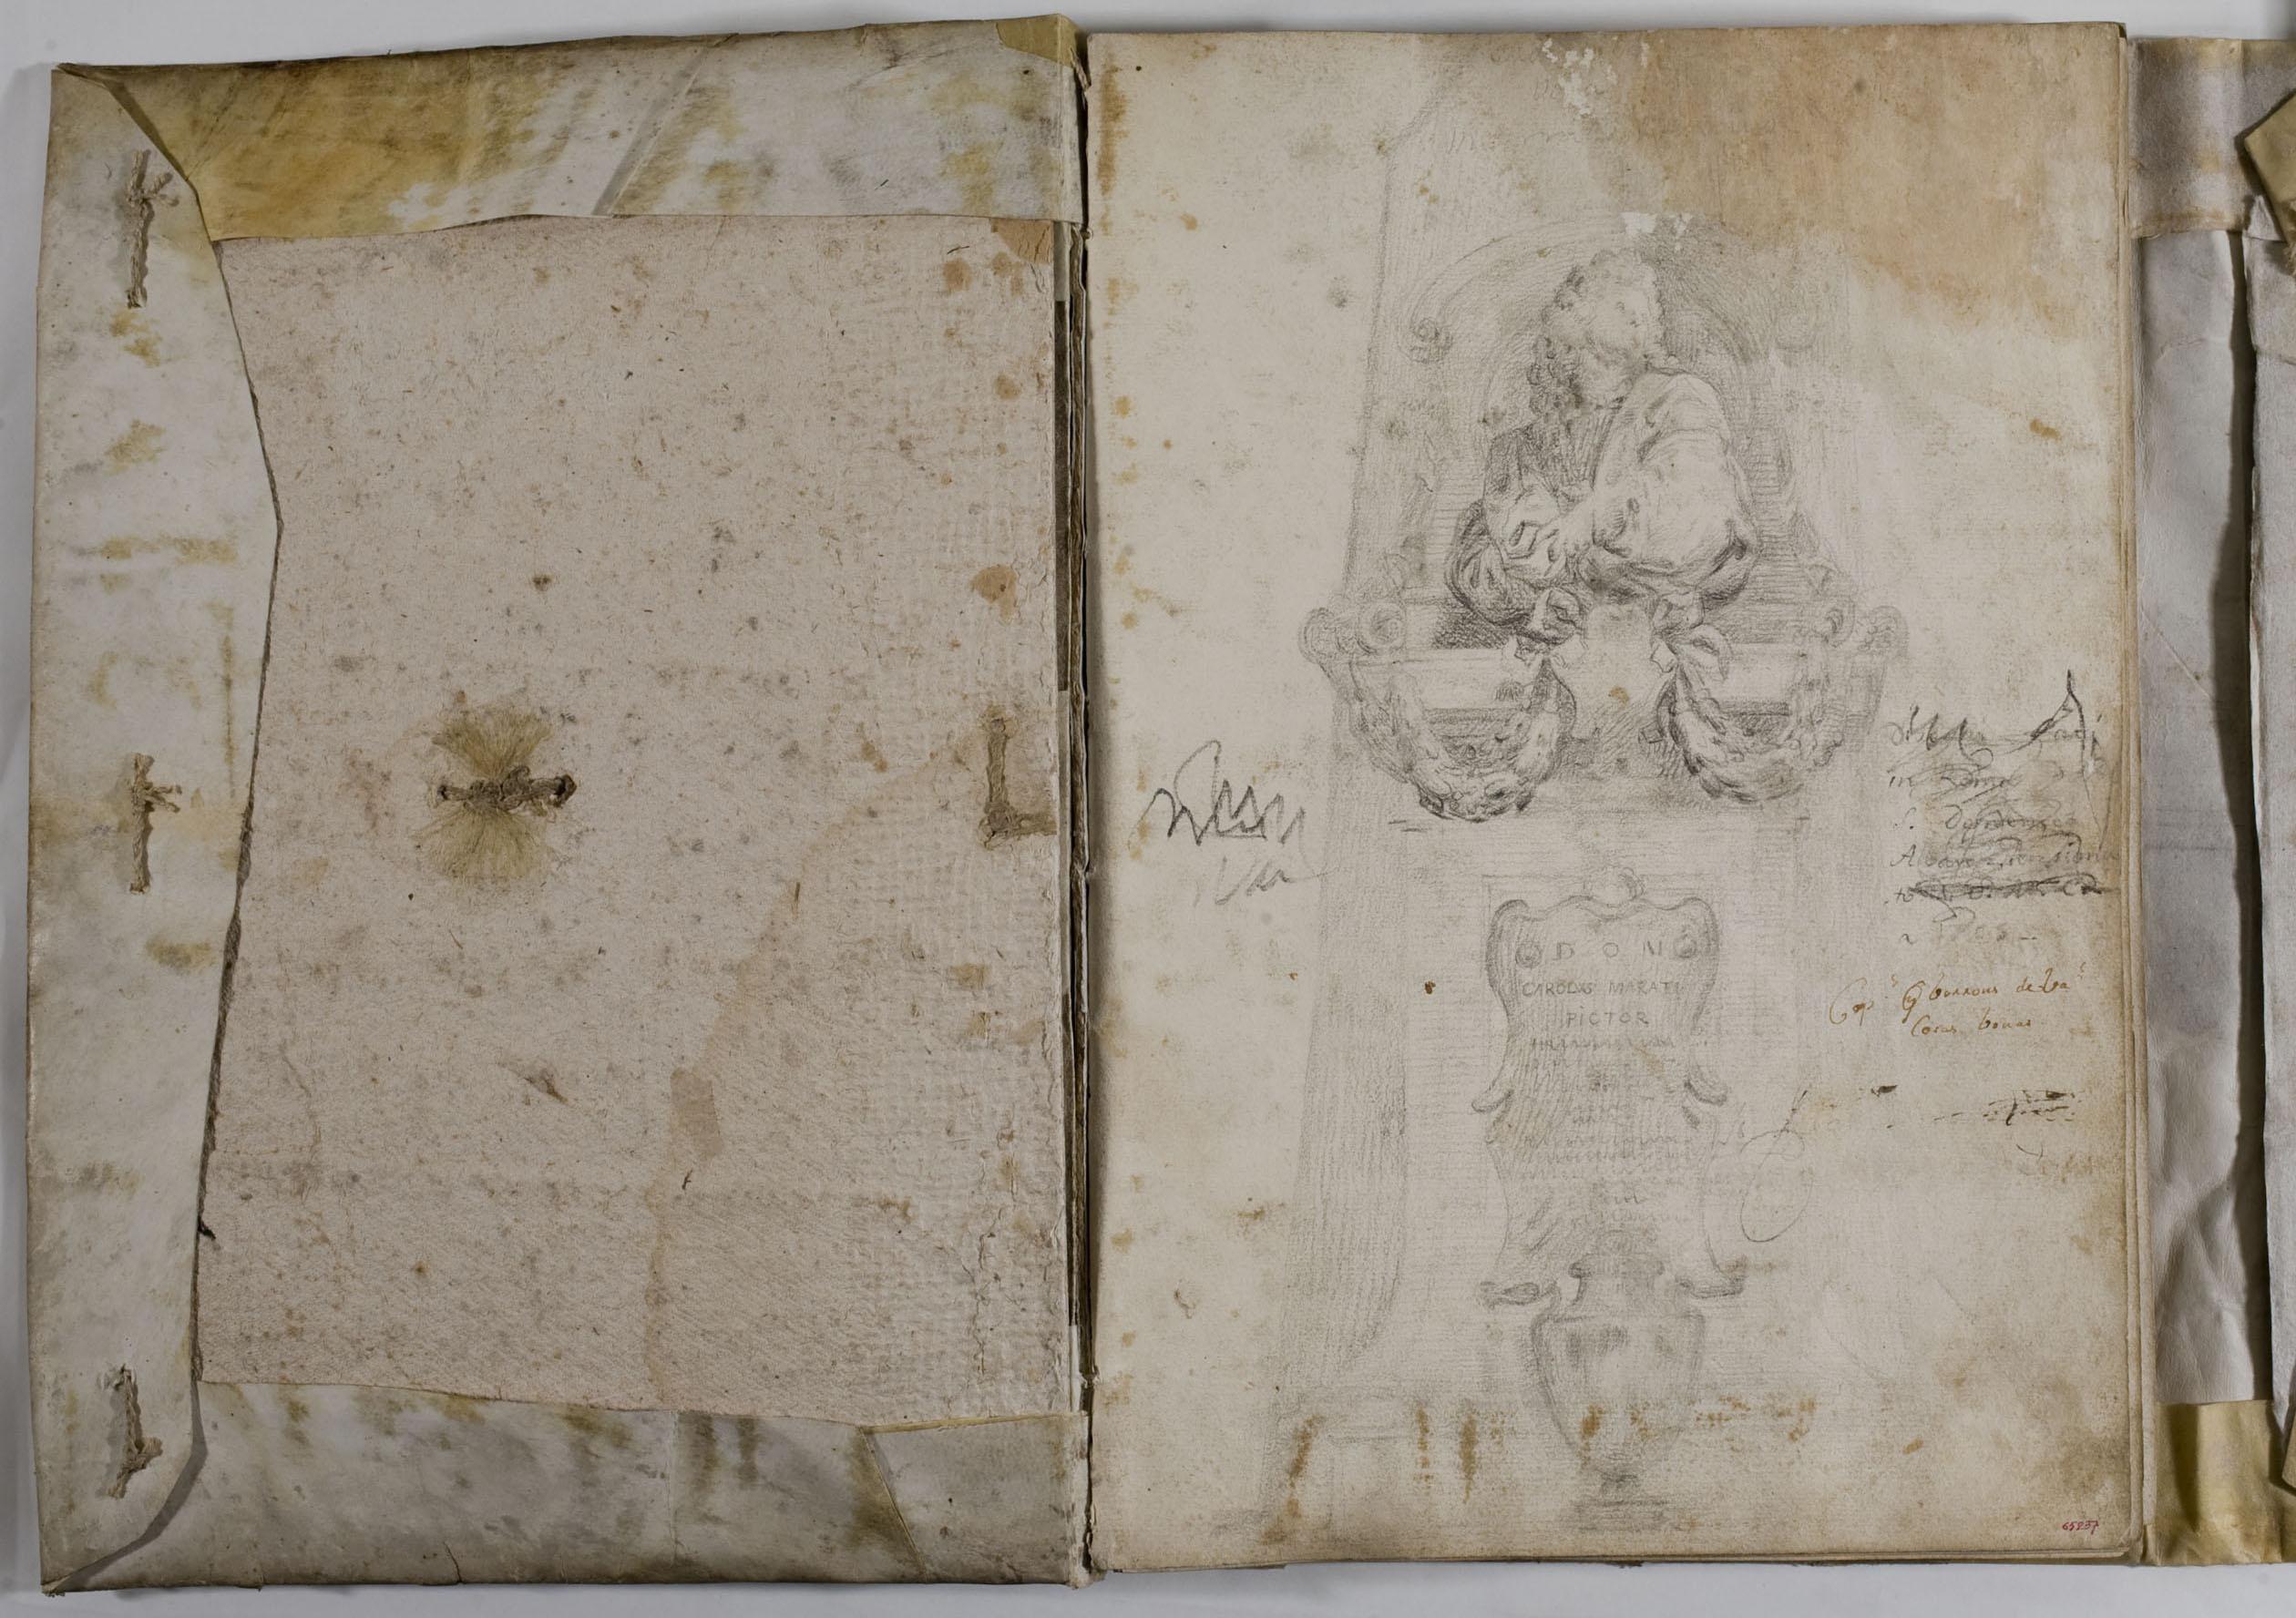 Domingo Álvarez Enciso - Roman album - Circa 1758-1762 or 1773-1789